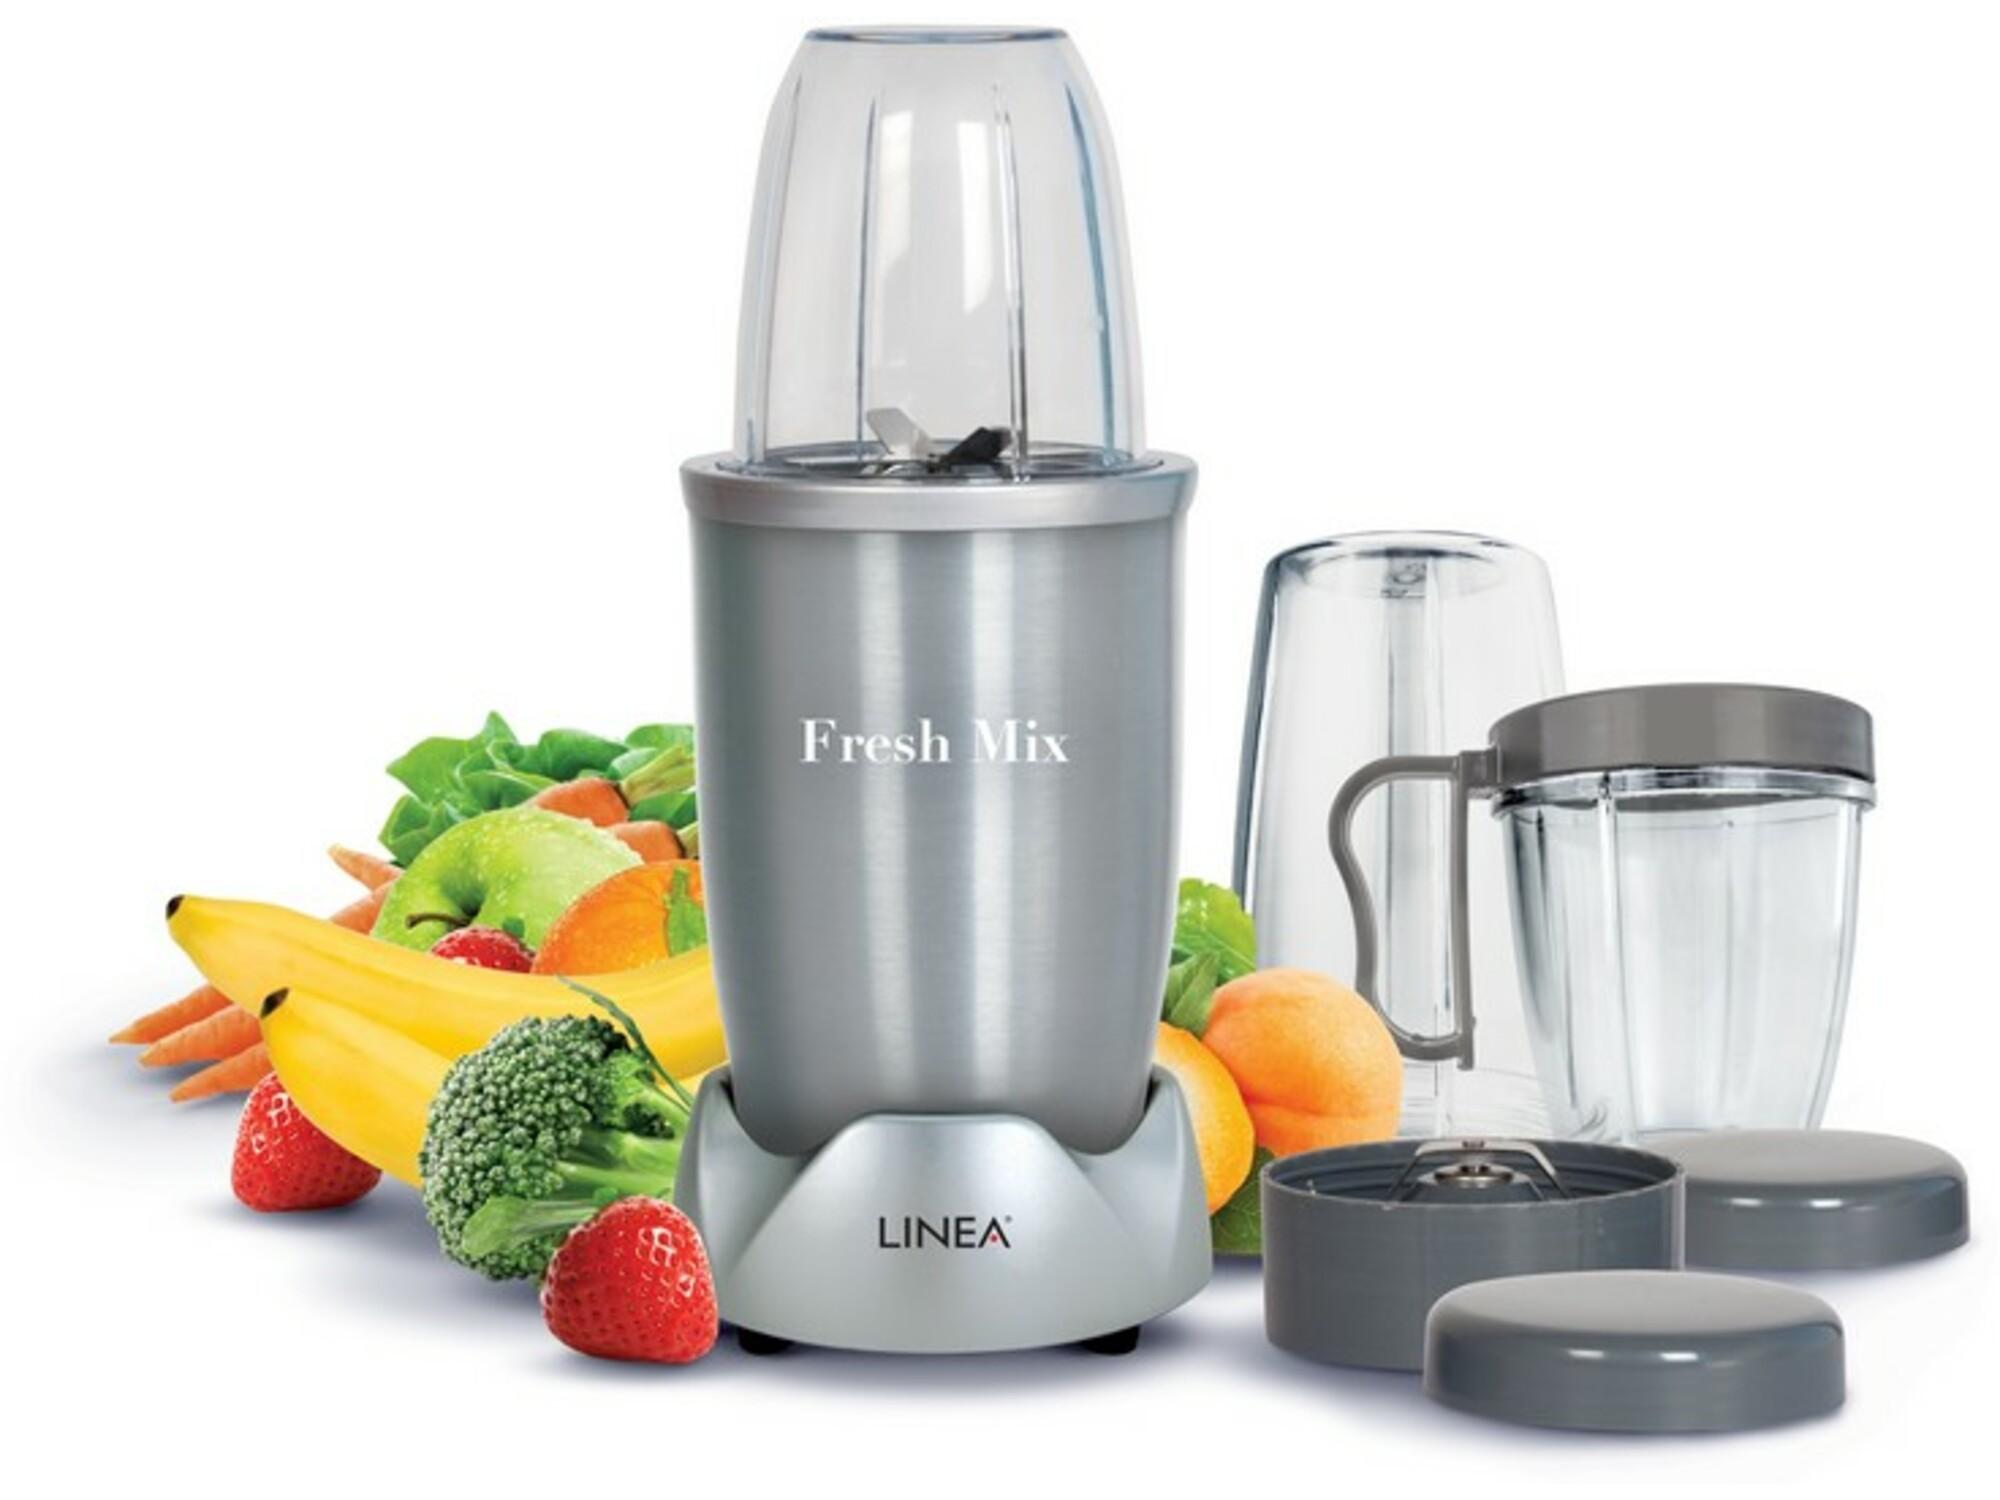 Linea Fresh Mix Blender LFM-0414